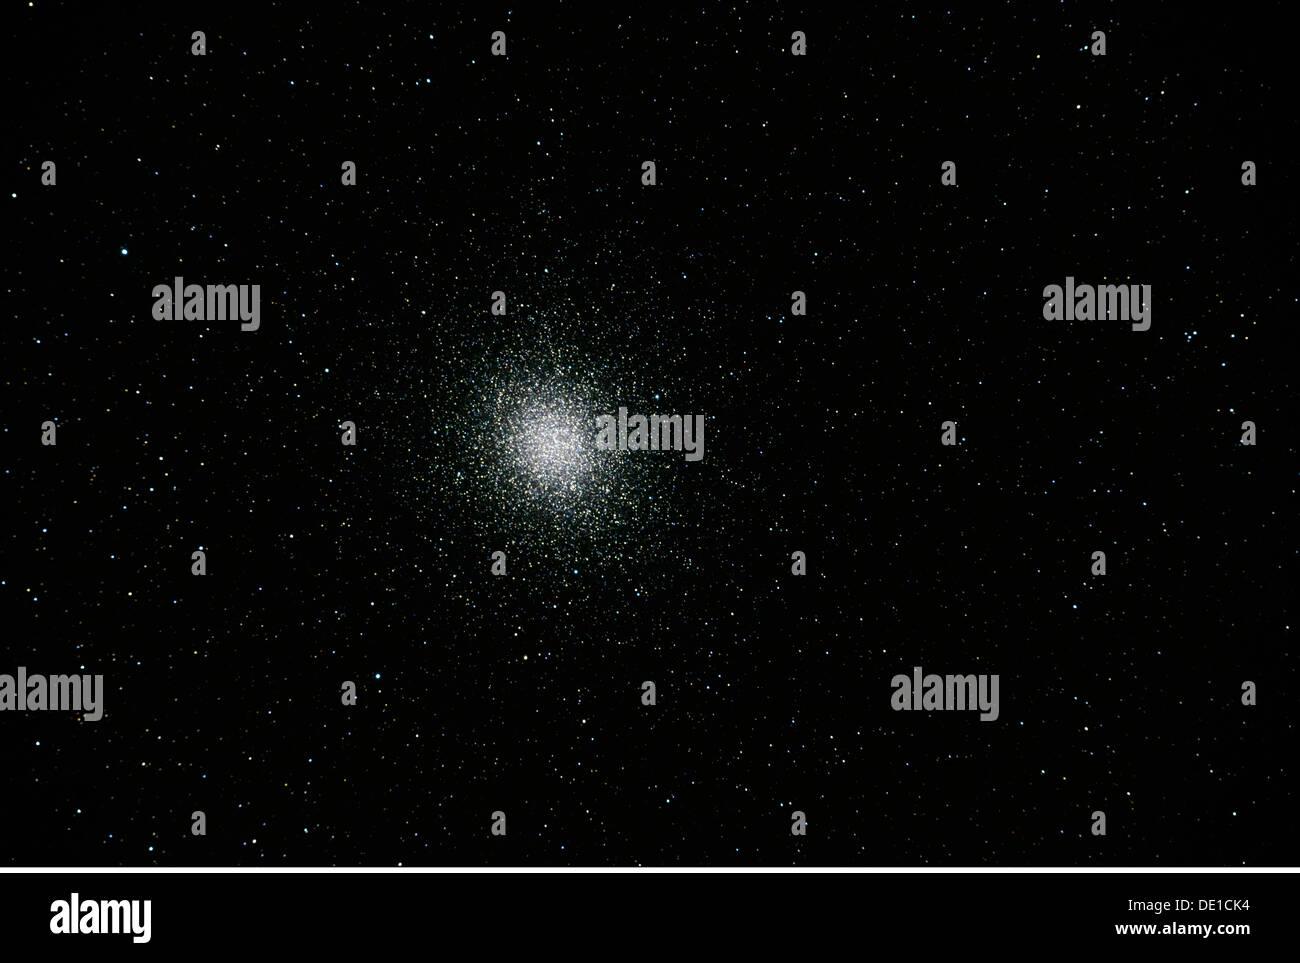 astronomy stars constellation Omega centauri above the Onjala Lodge Namibia globular cluster Centaur Centaurus starry - Stock Image